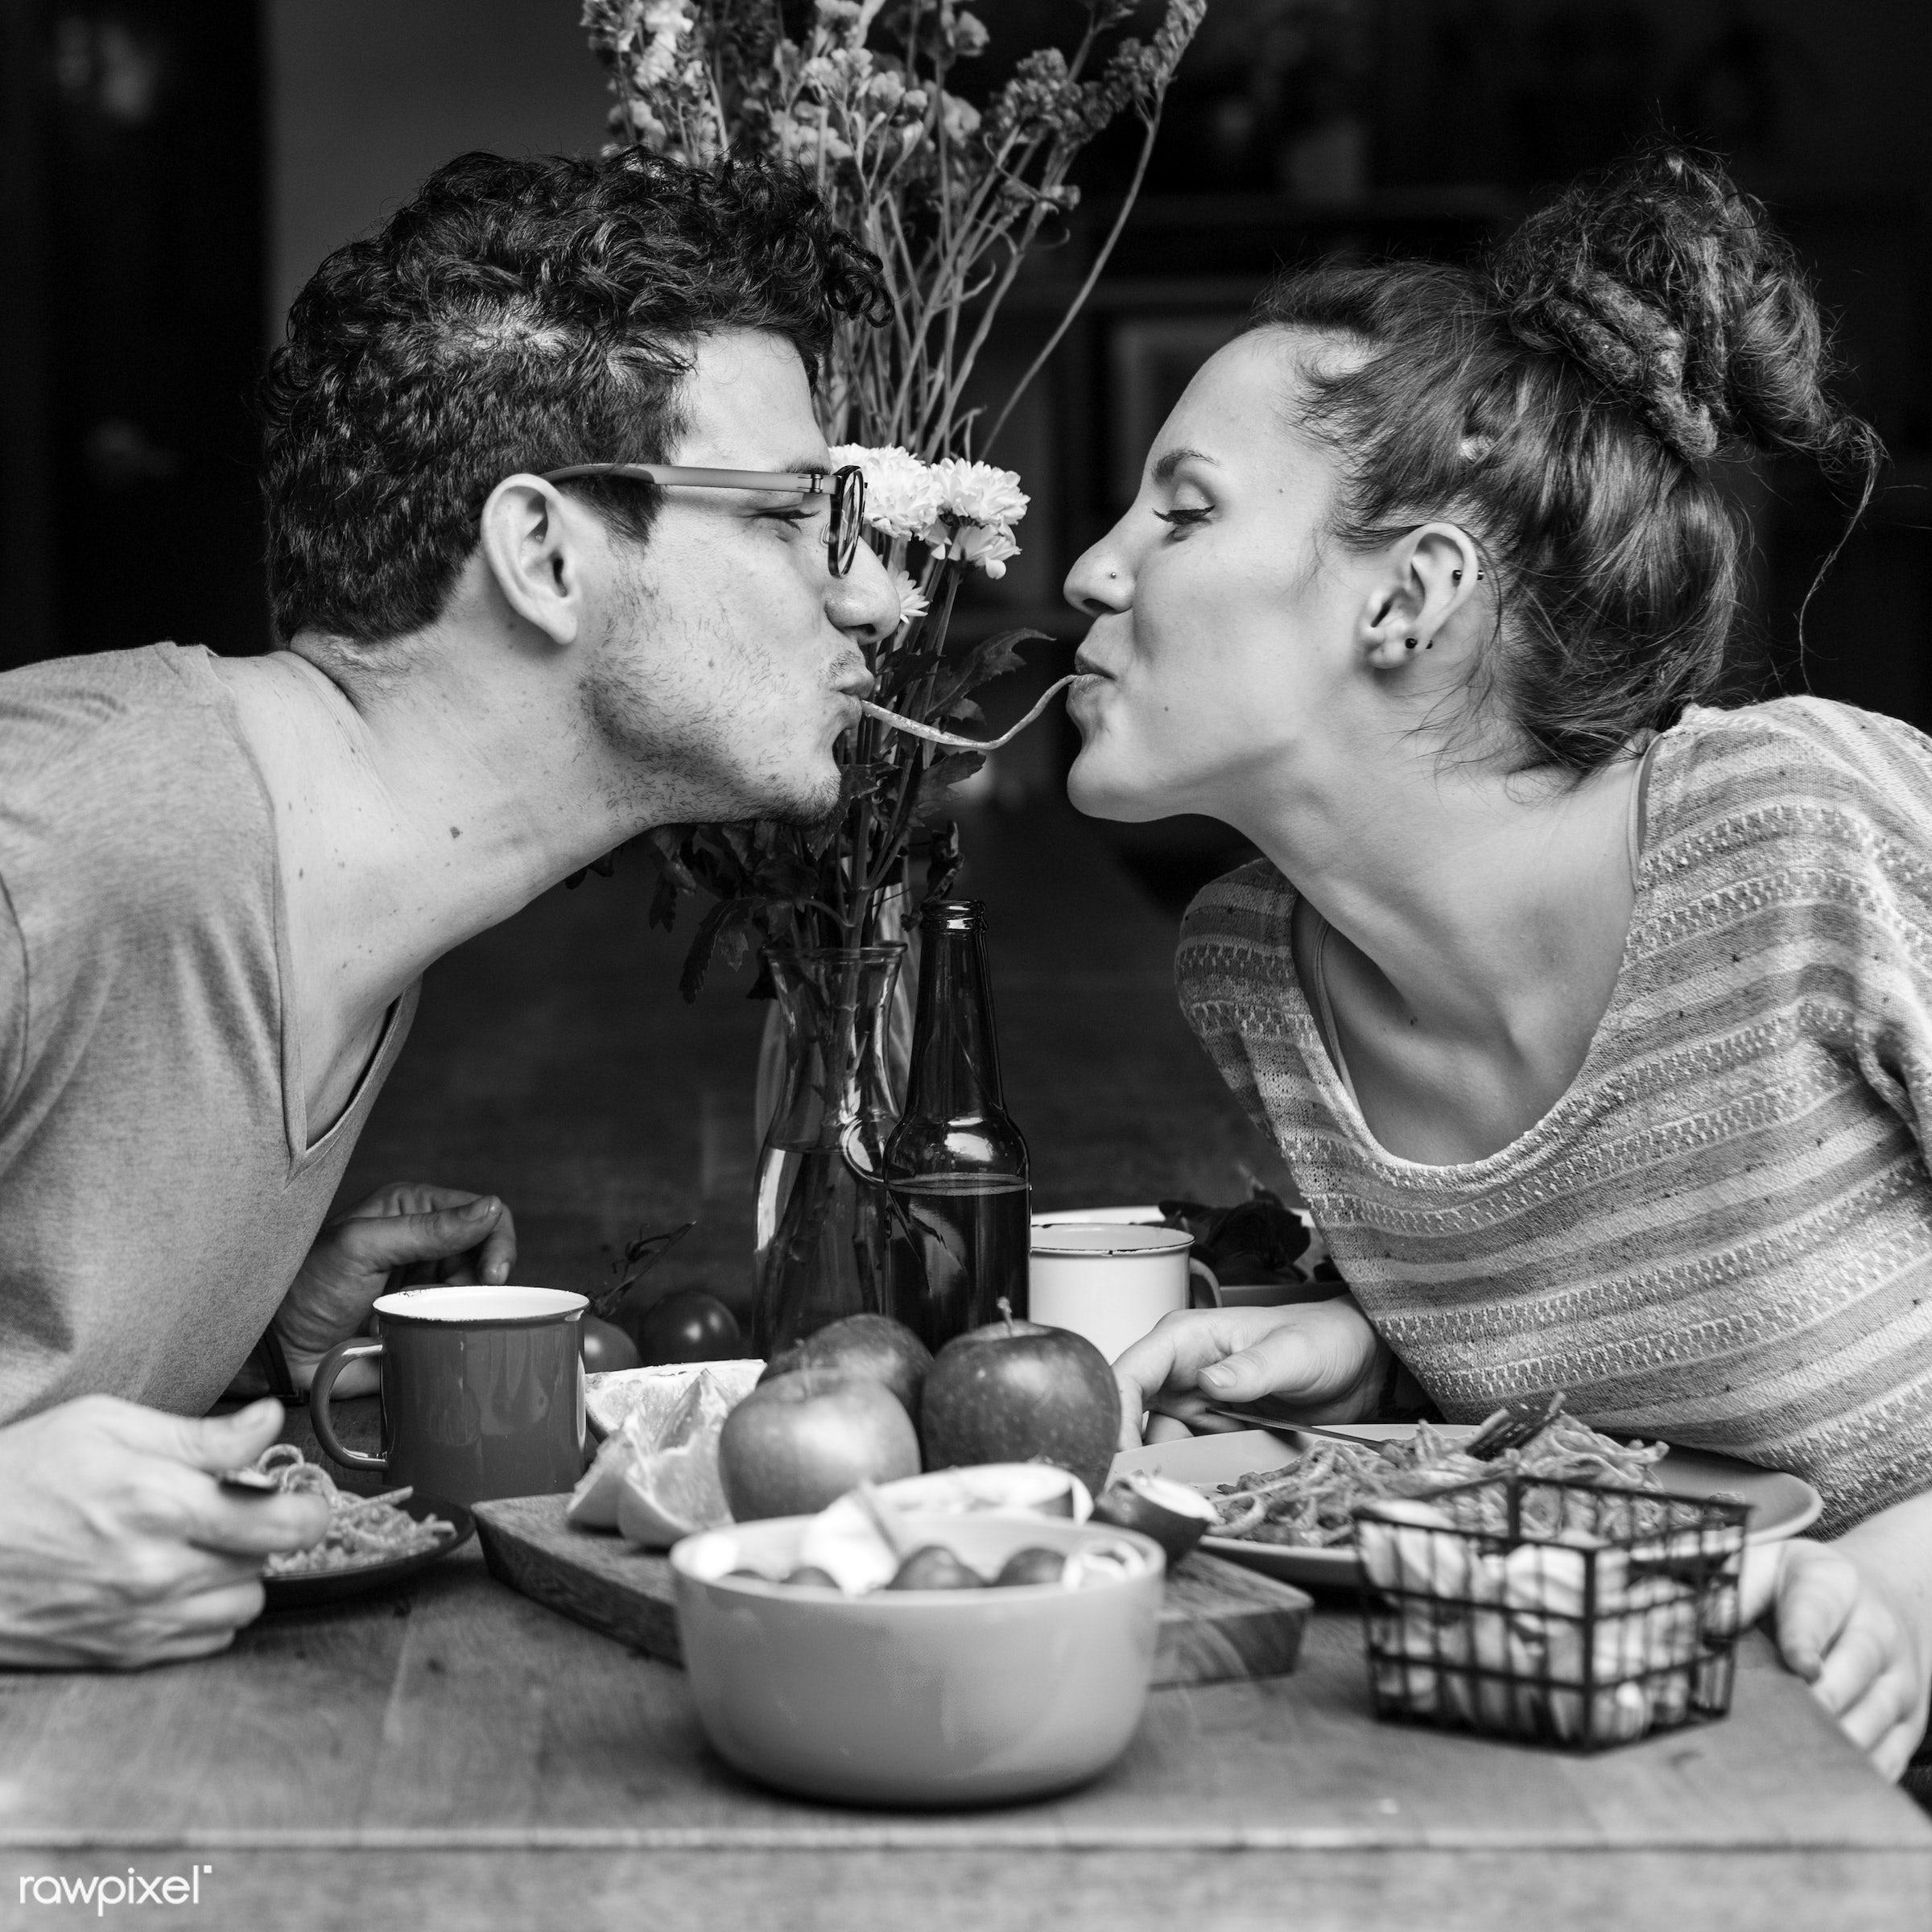 dinner, food, couple, nutrition, activity, apple, bonding, boyfriend, breakfast, casual, cheerful, cuisine, culinary,...